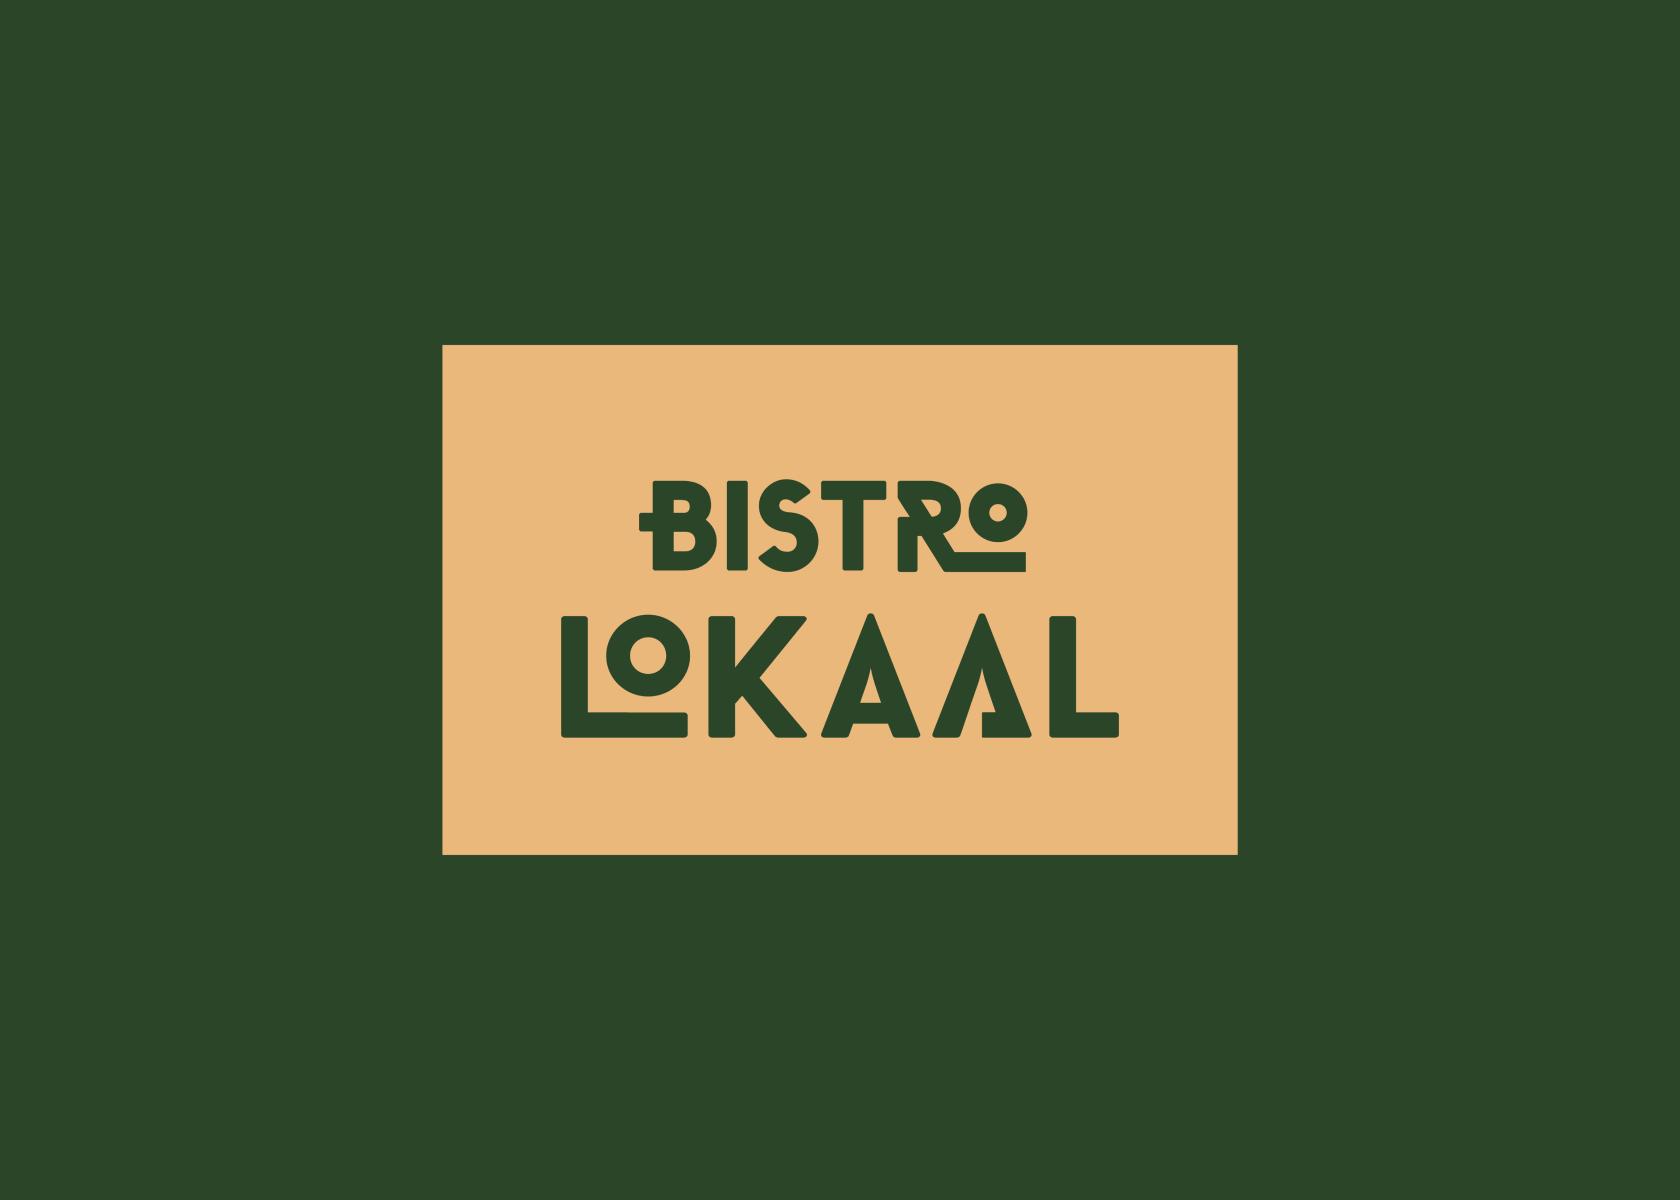 Bistro Lokaal